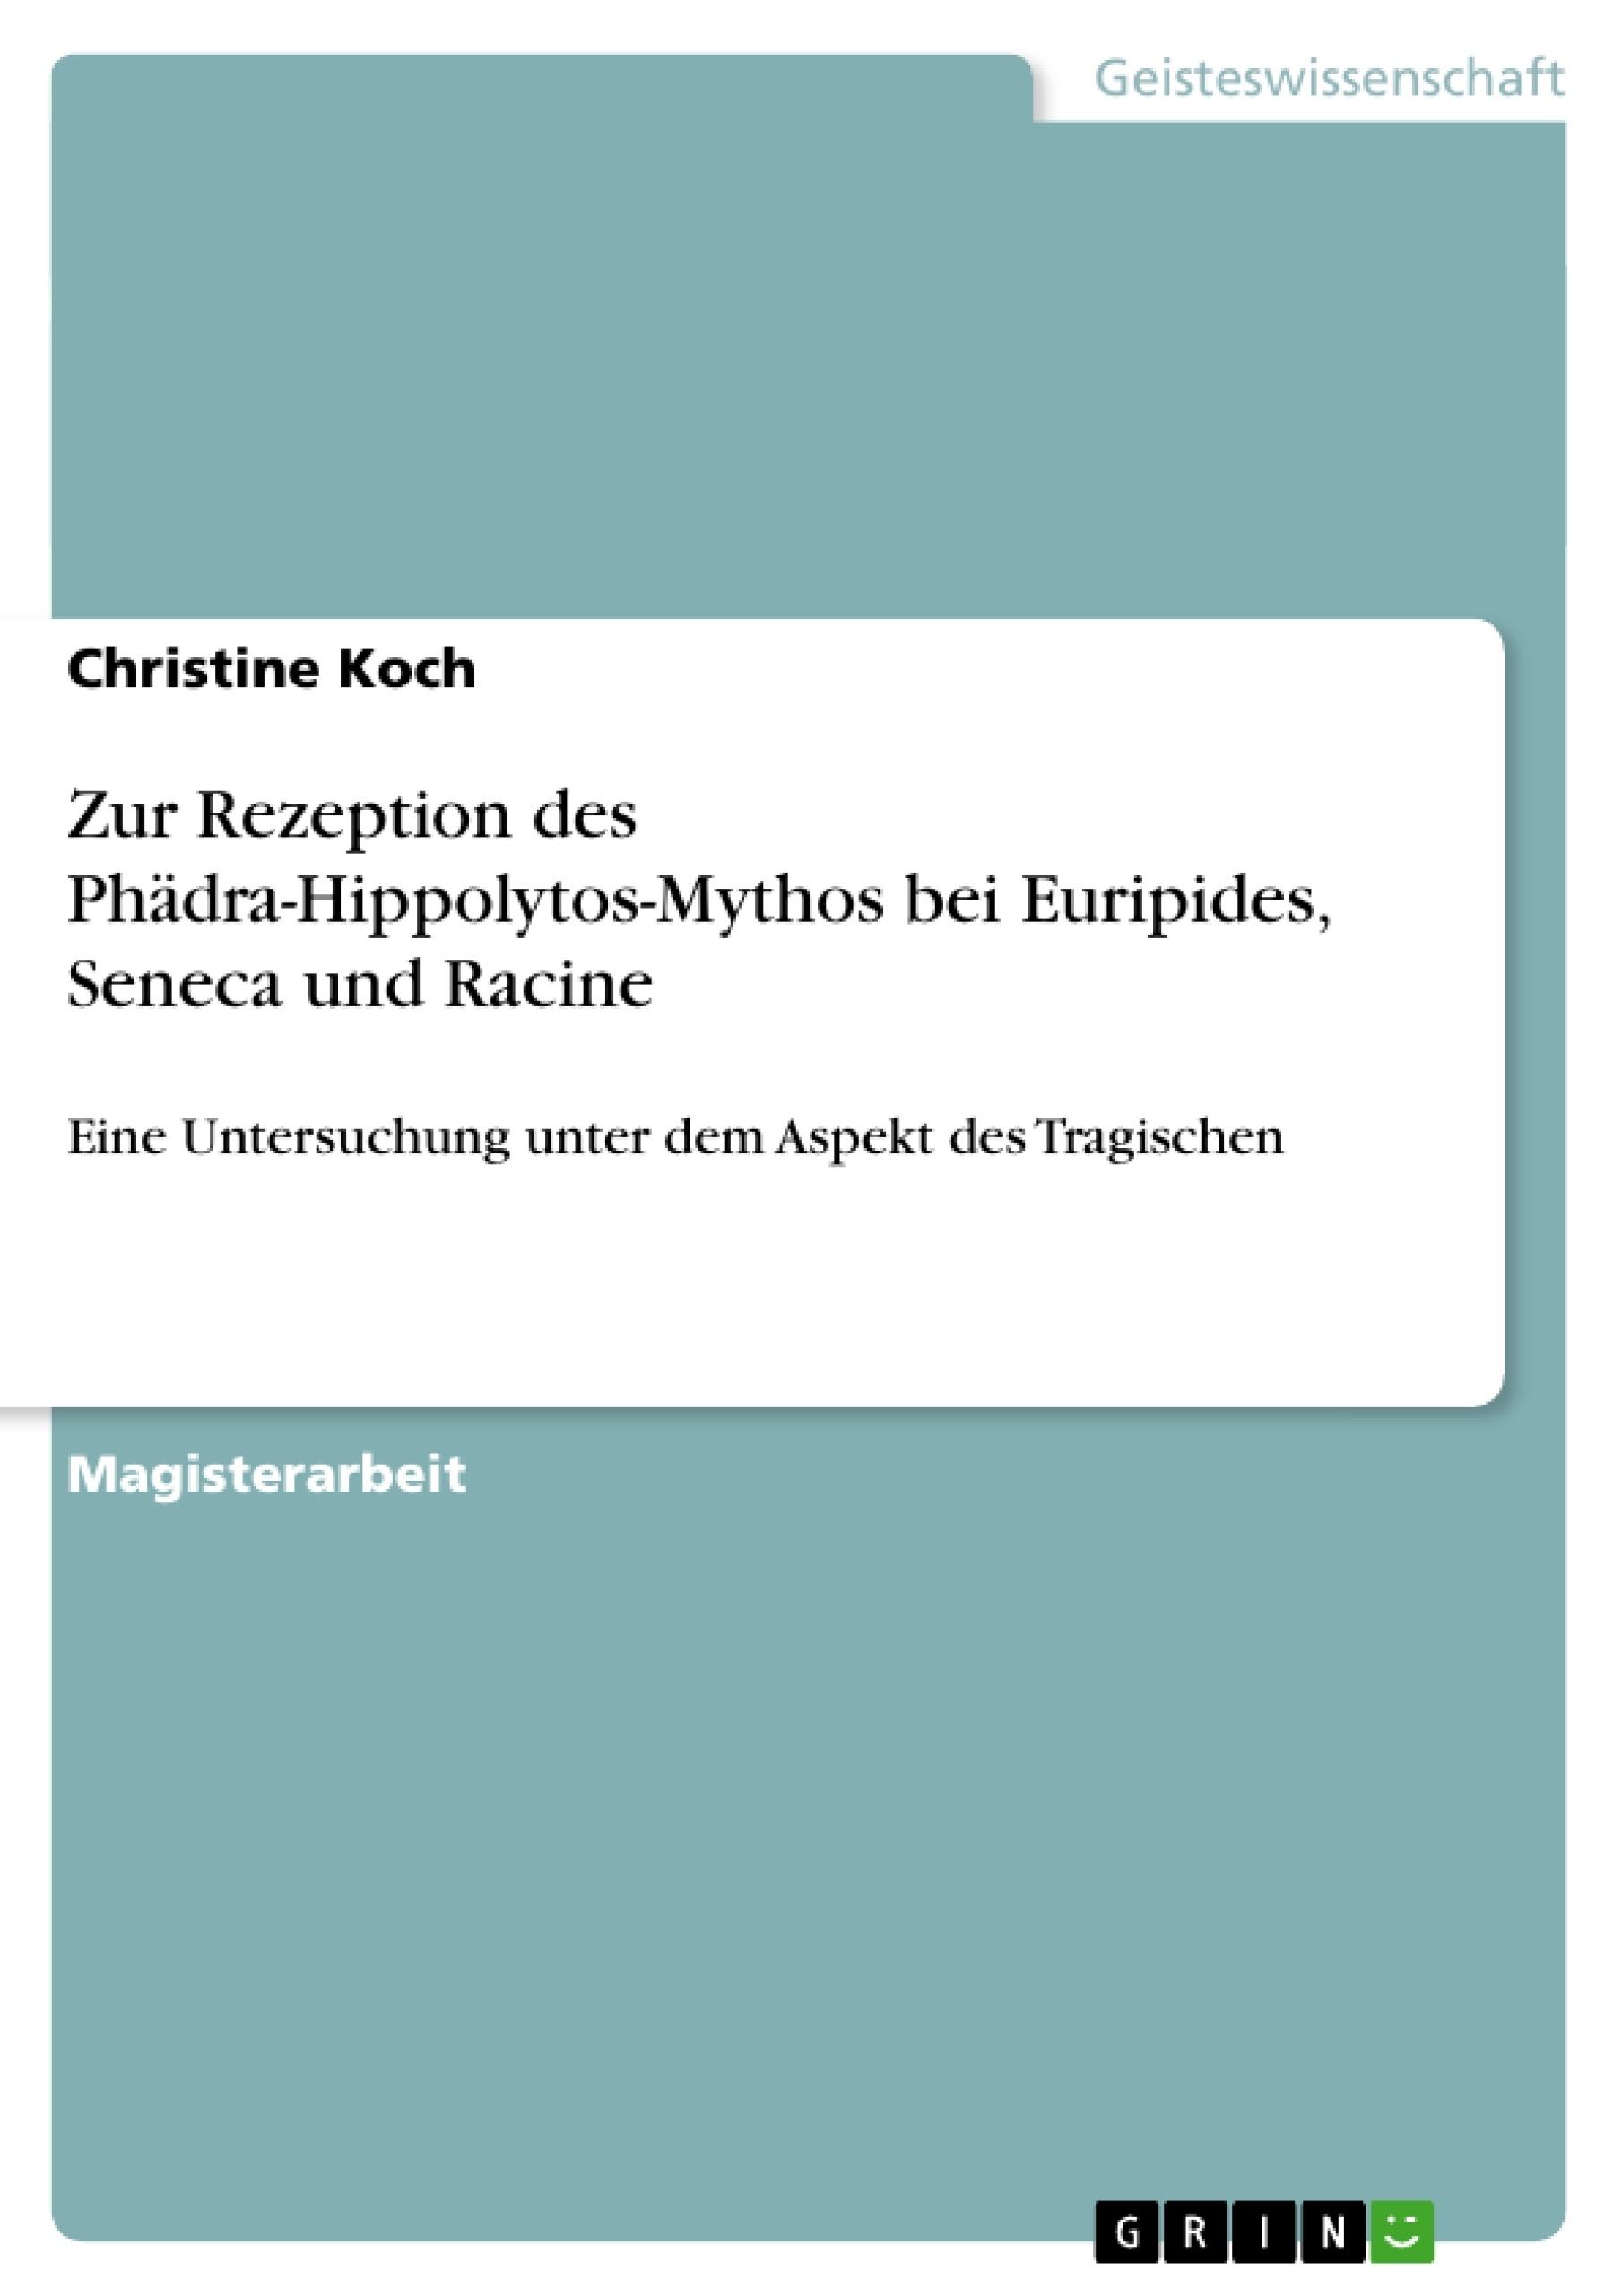 Titel: Zur Rezeption des Phädra-Hippolytos-Mythos bei Euripides, Seneca und Racine